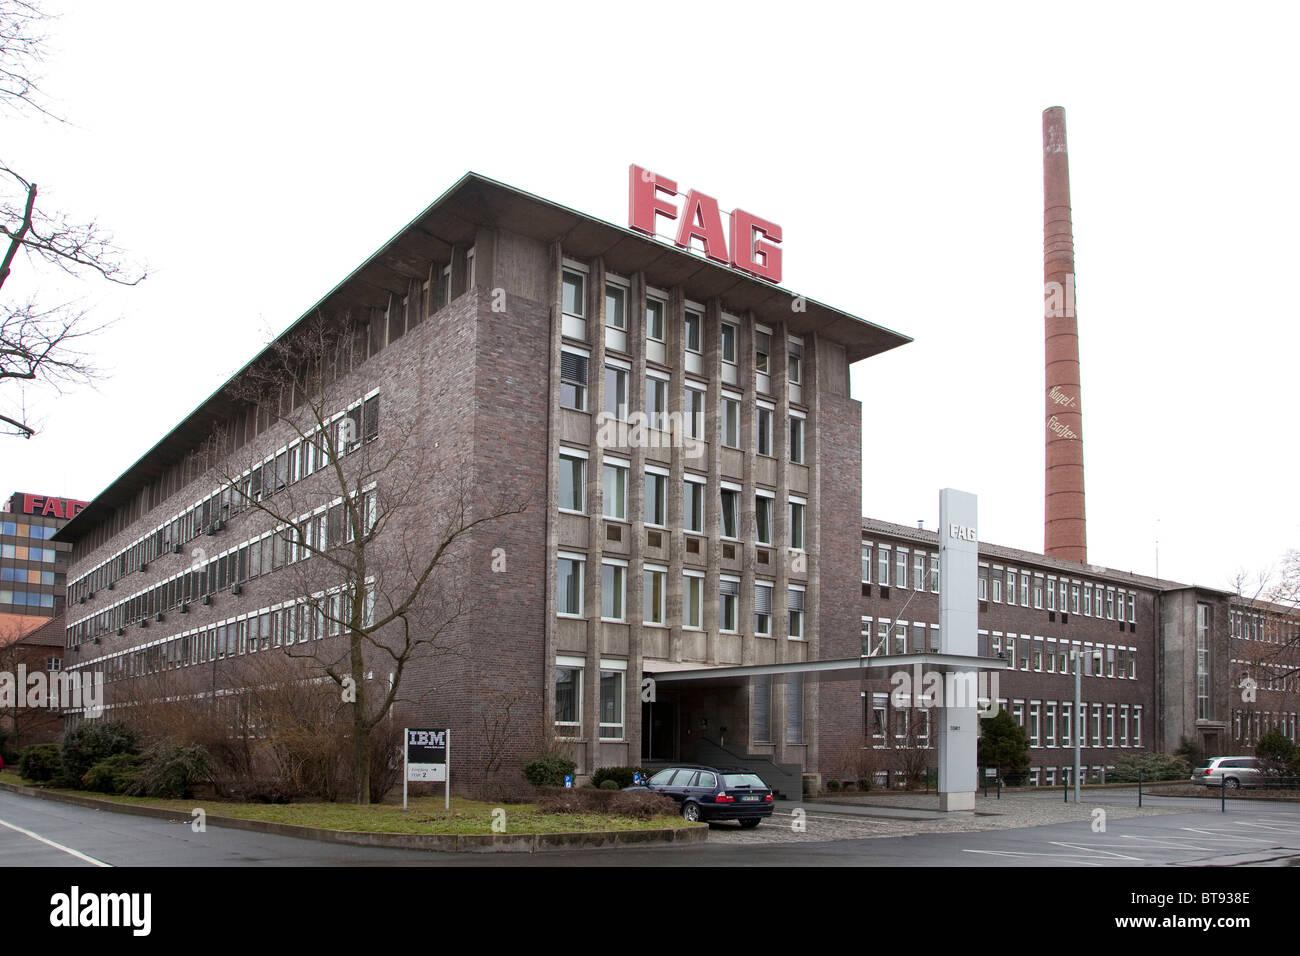 Rollen-Element Lagerhersteller, FAG Schaeffler KG, Schweinfurt, Bayern, Deutschland, Europa Stockbild